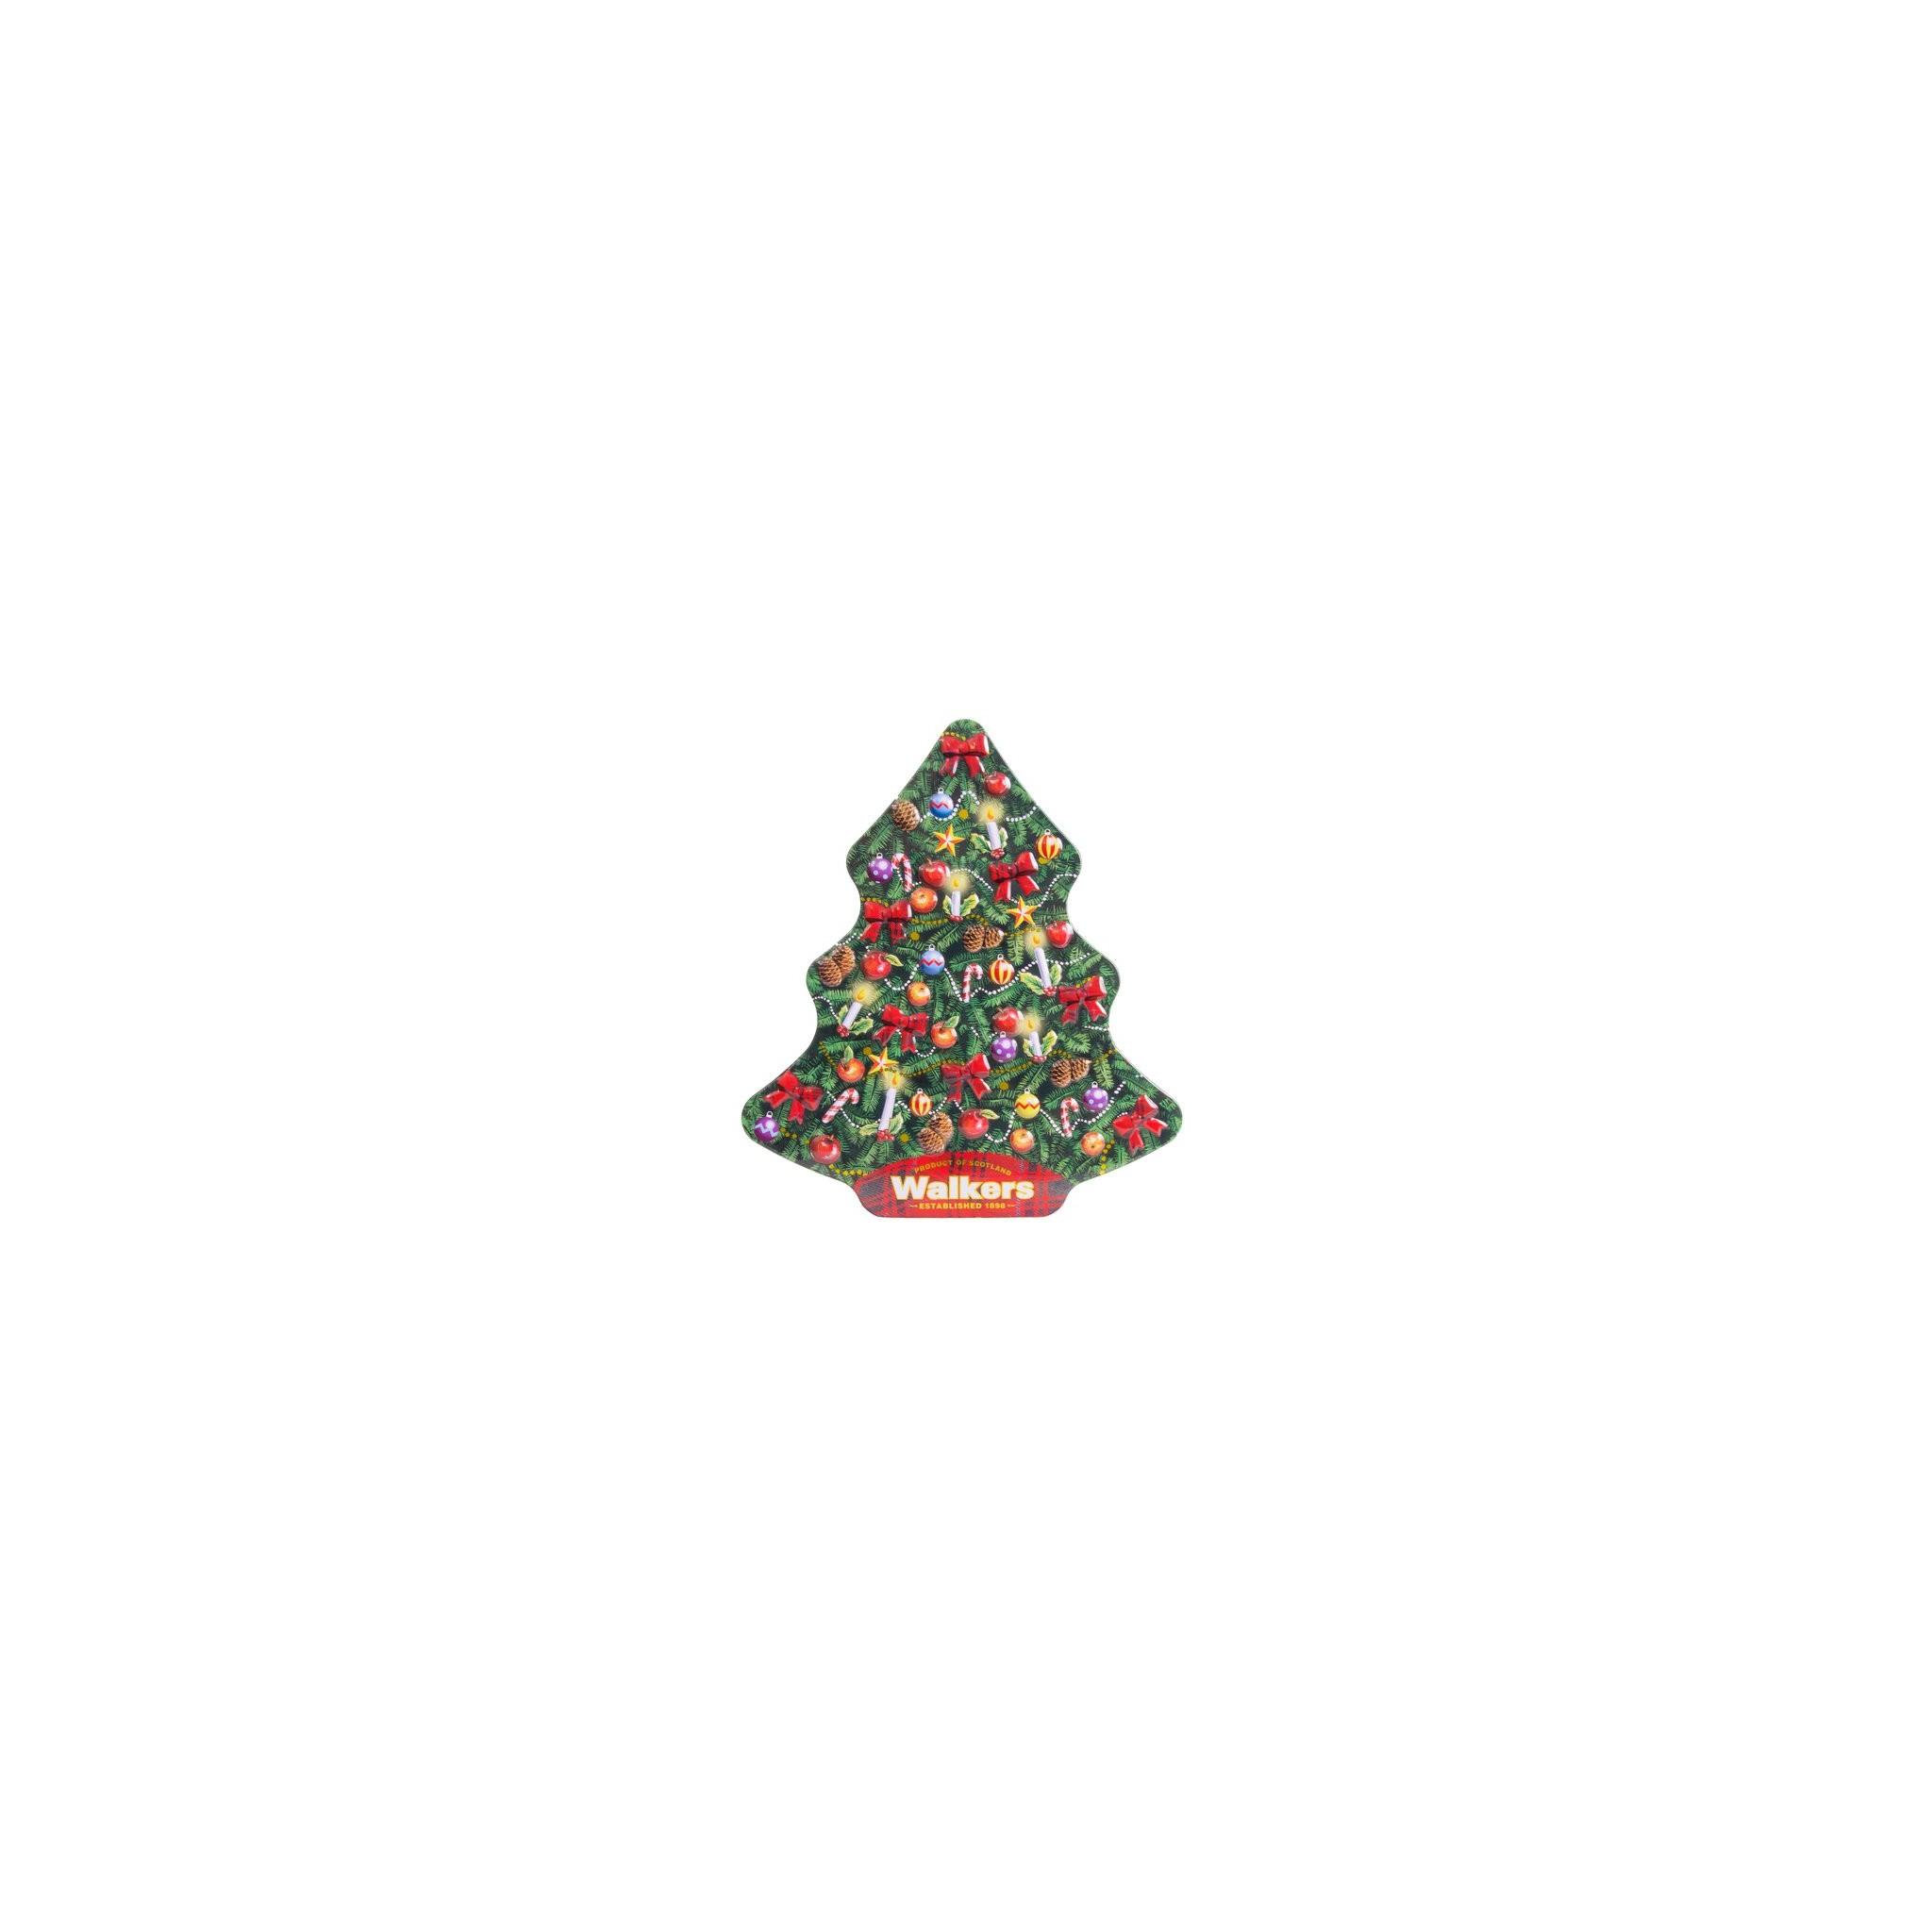 Biscotti Classici Di Natale.Vendita Online Walkers A Forma Di Albero Di Natale Biscotti Scozzesi